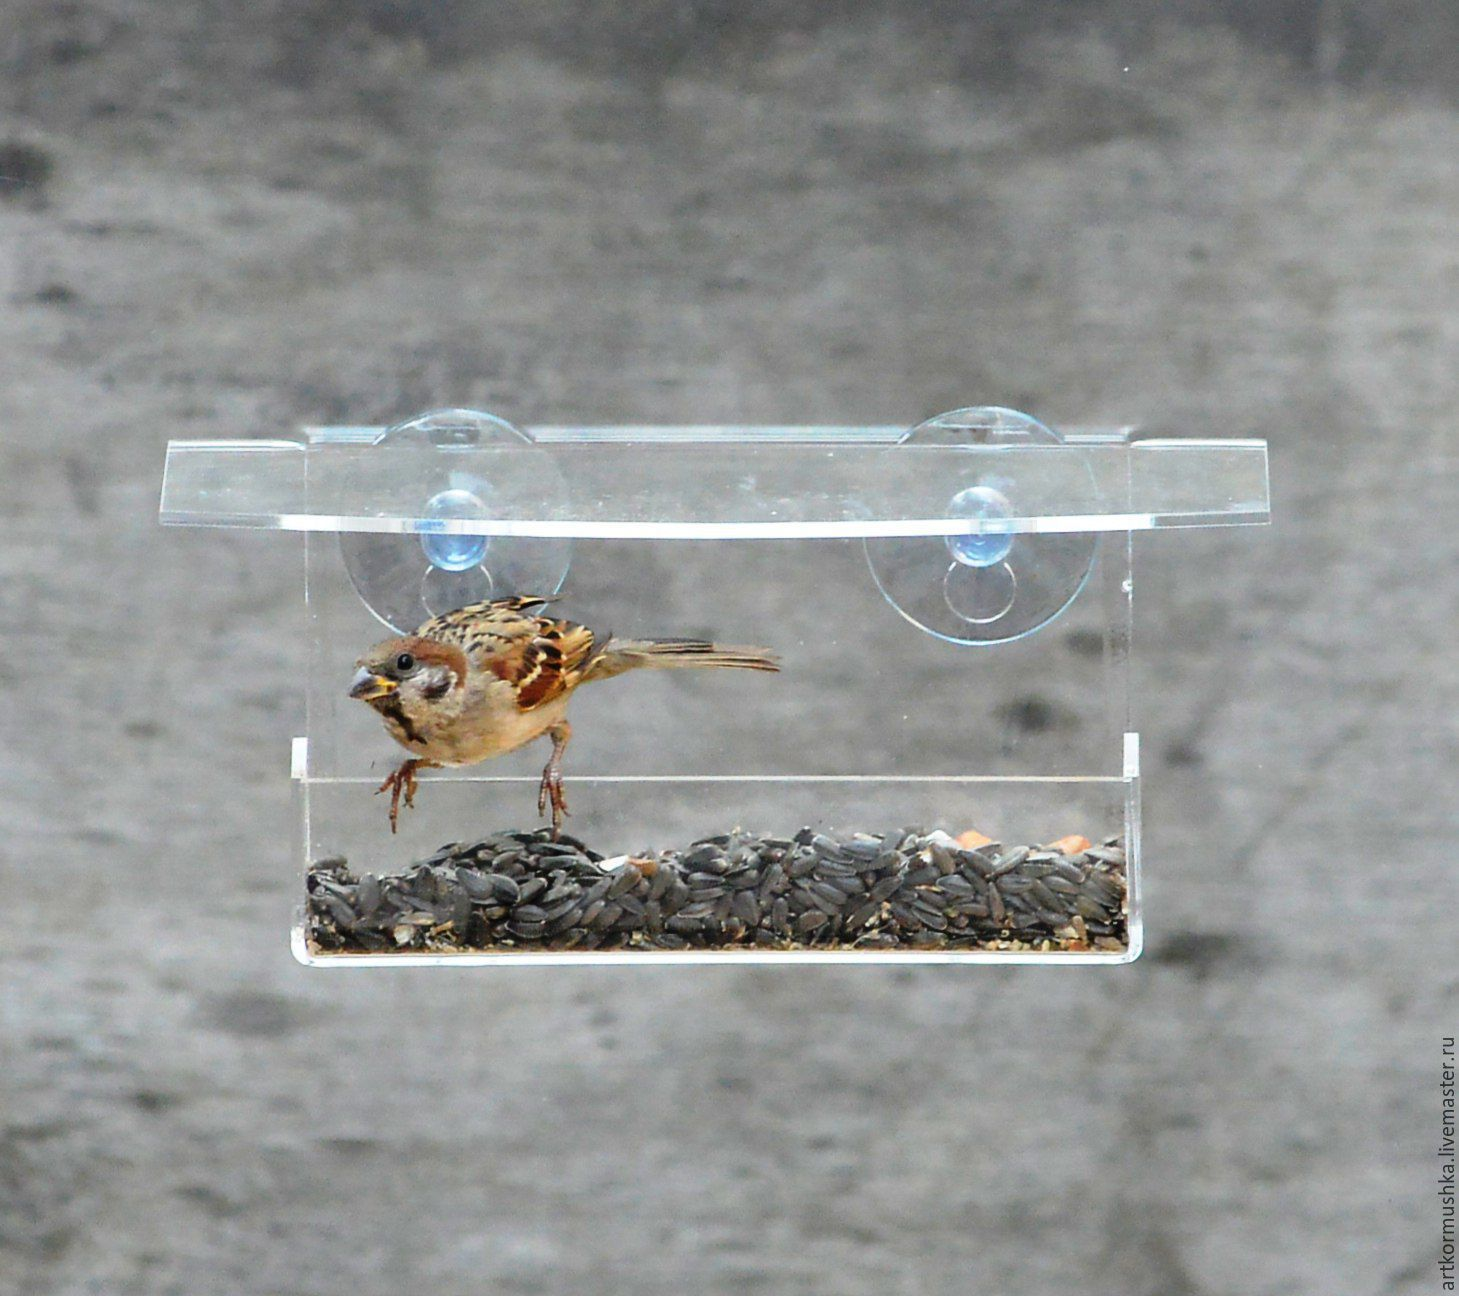 Оконная кормушка для птиц на присосках